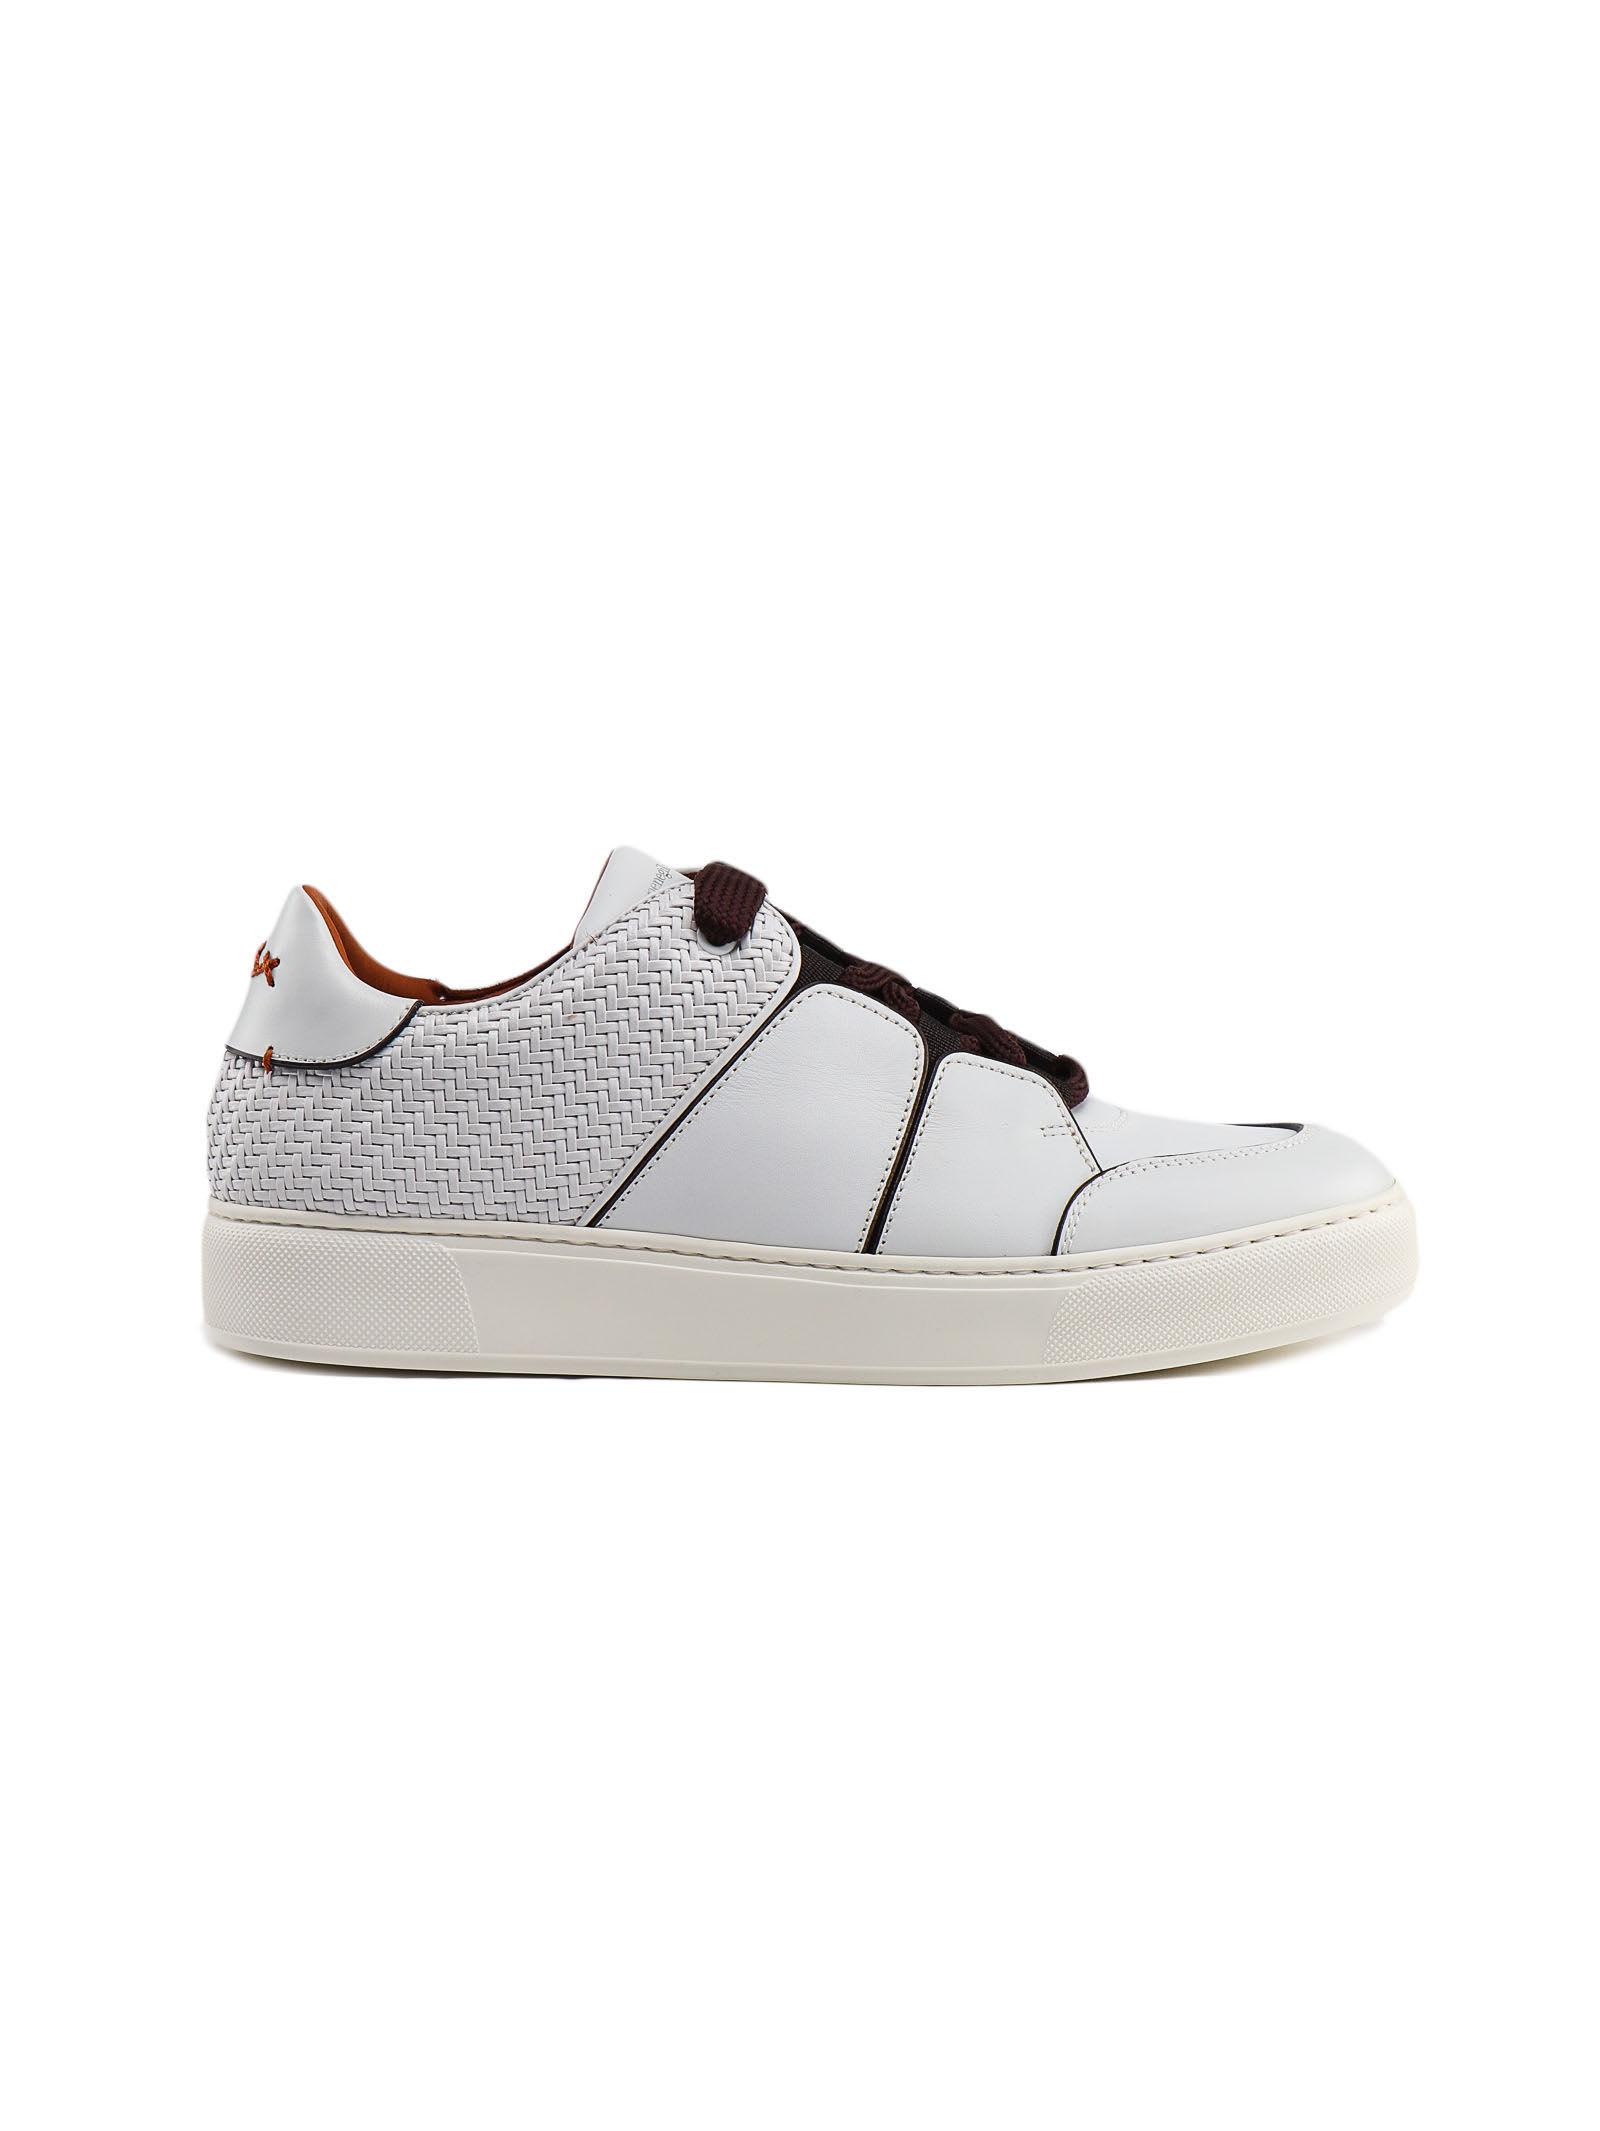 Ermenegildo Zegna Sneaker Tiziano - Bia